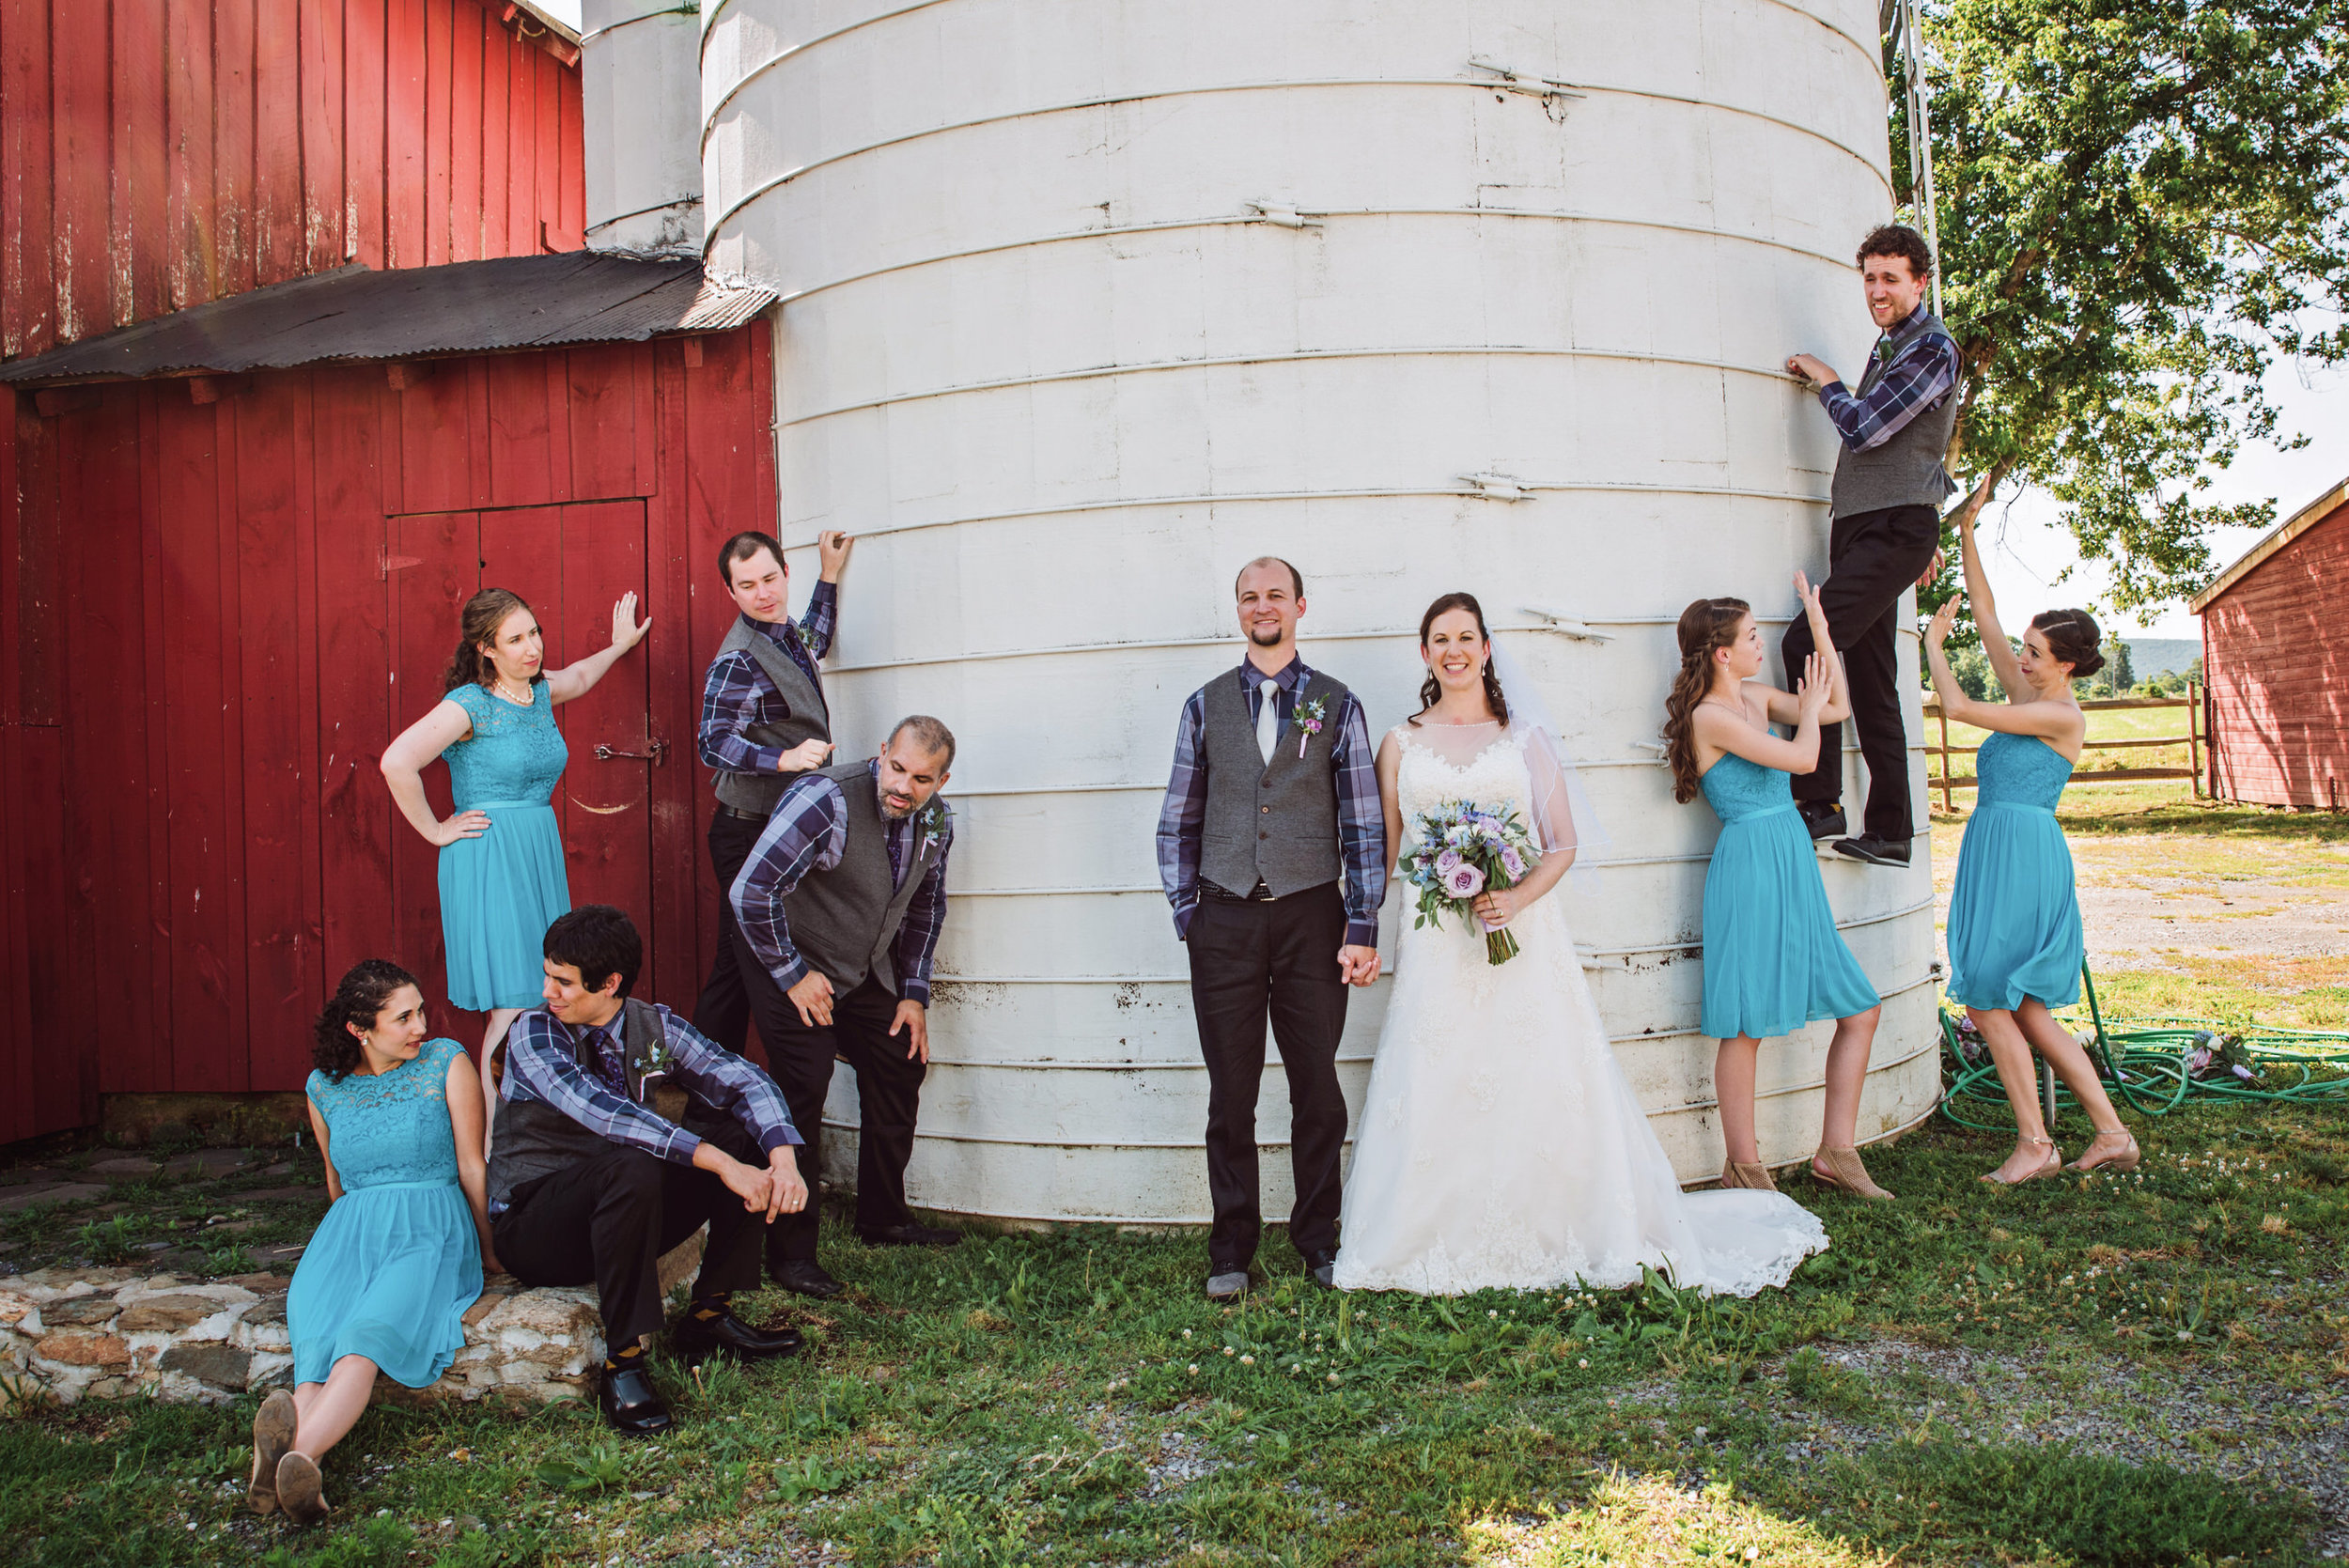 EastLynnFarmWedding-Steph&Aaron-Family-WP-82.jpg